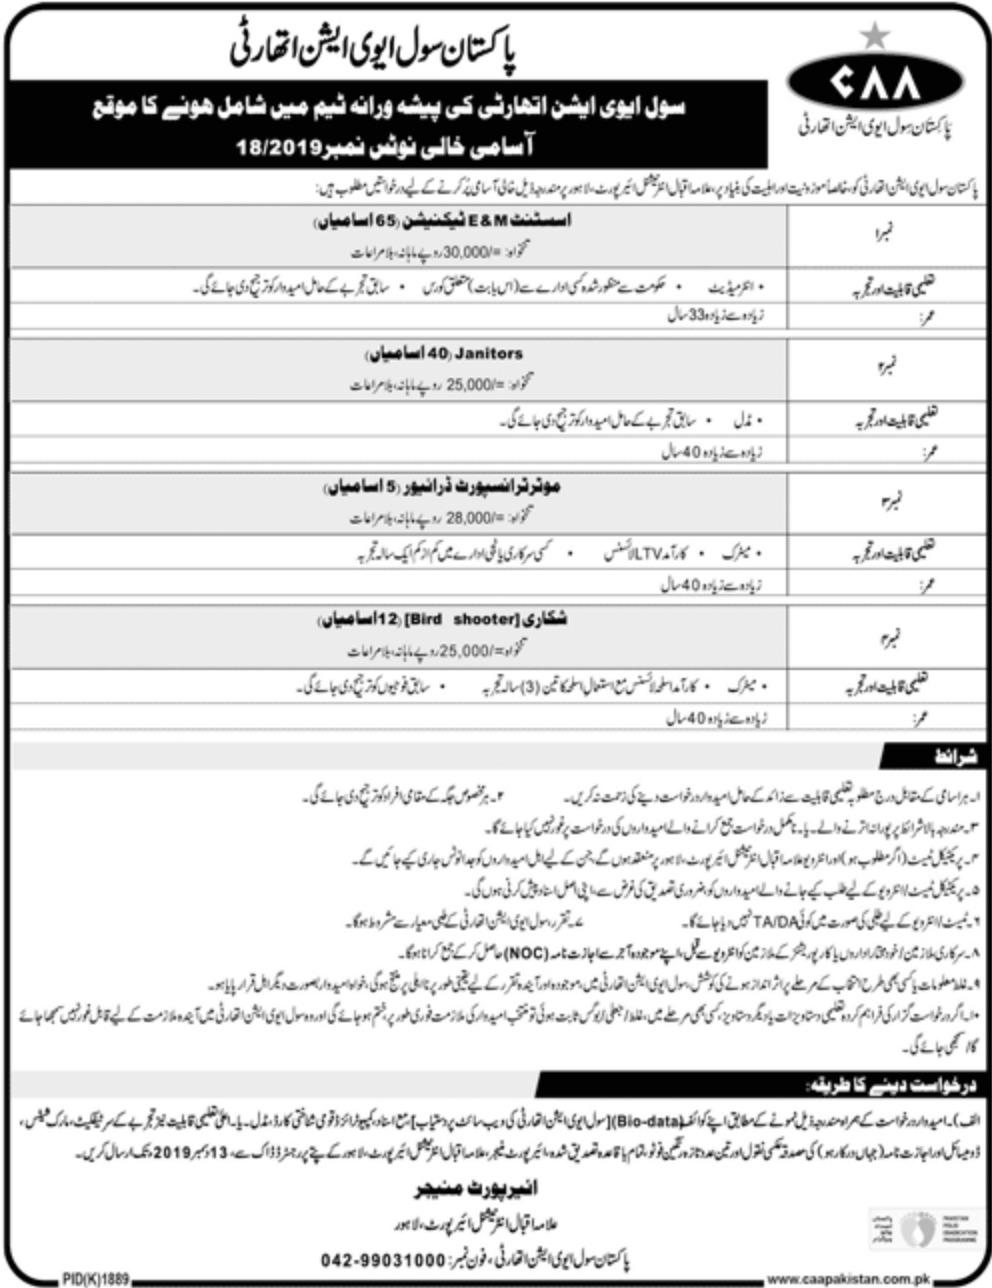 Allama-Iqbal-International-Airport-Lahore-CAA-Pakistan-Jobs-2019